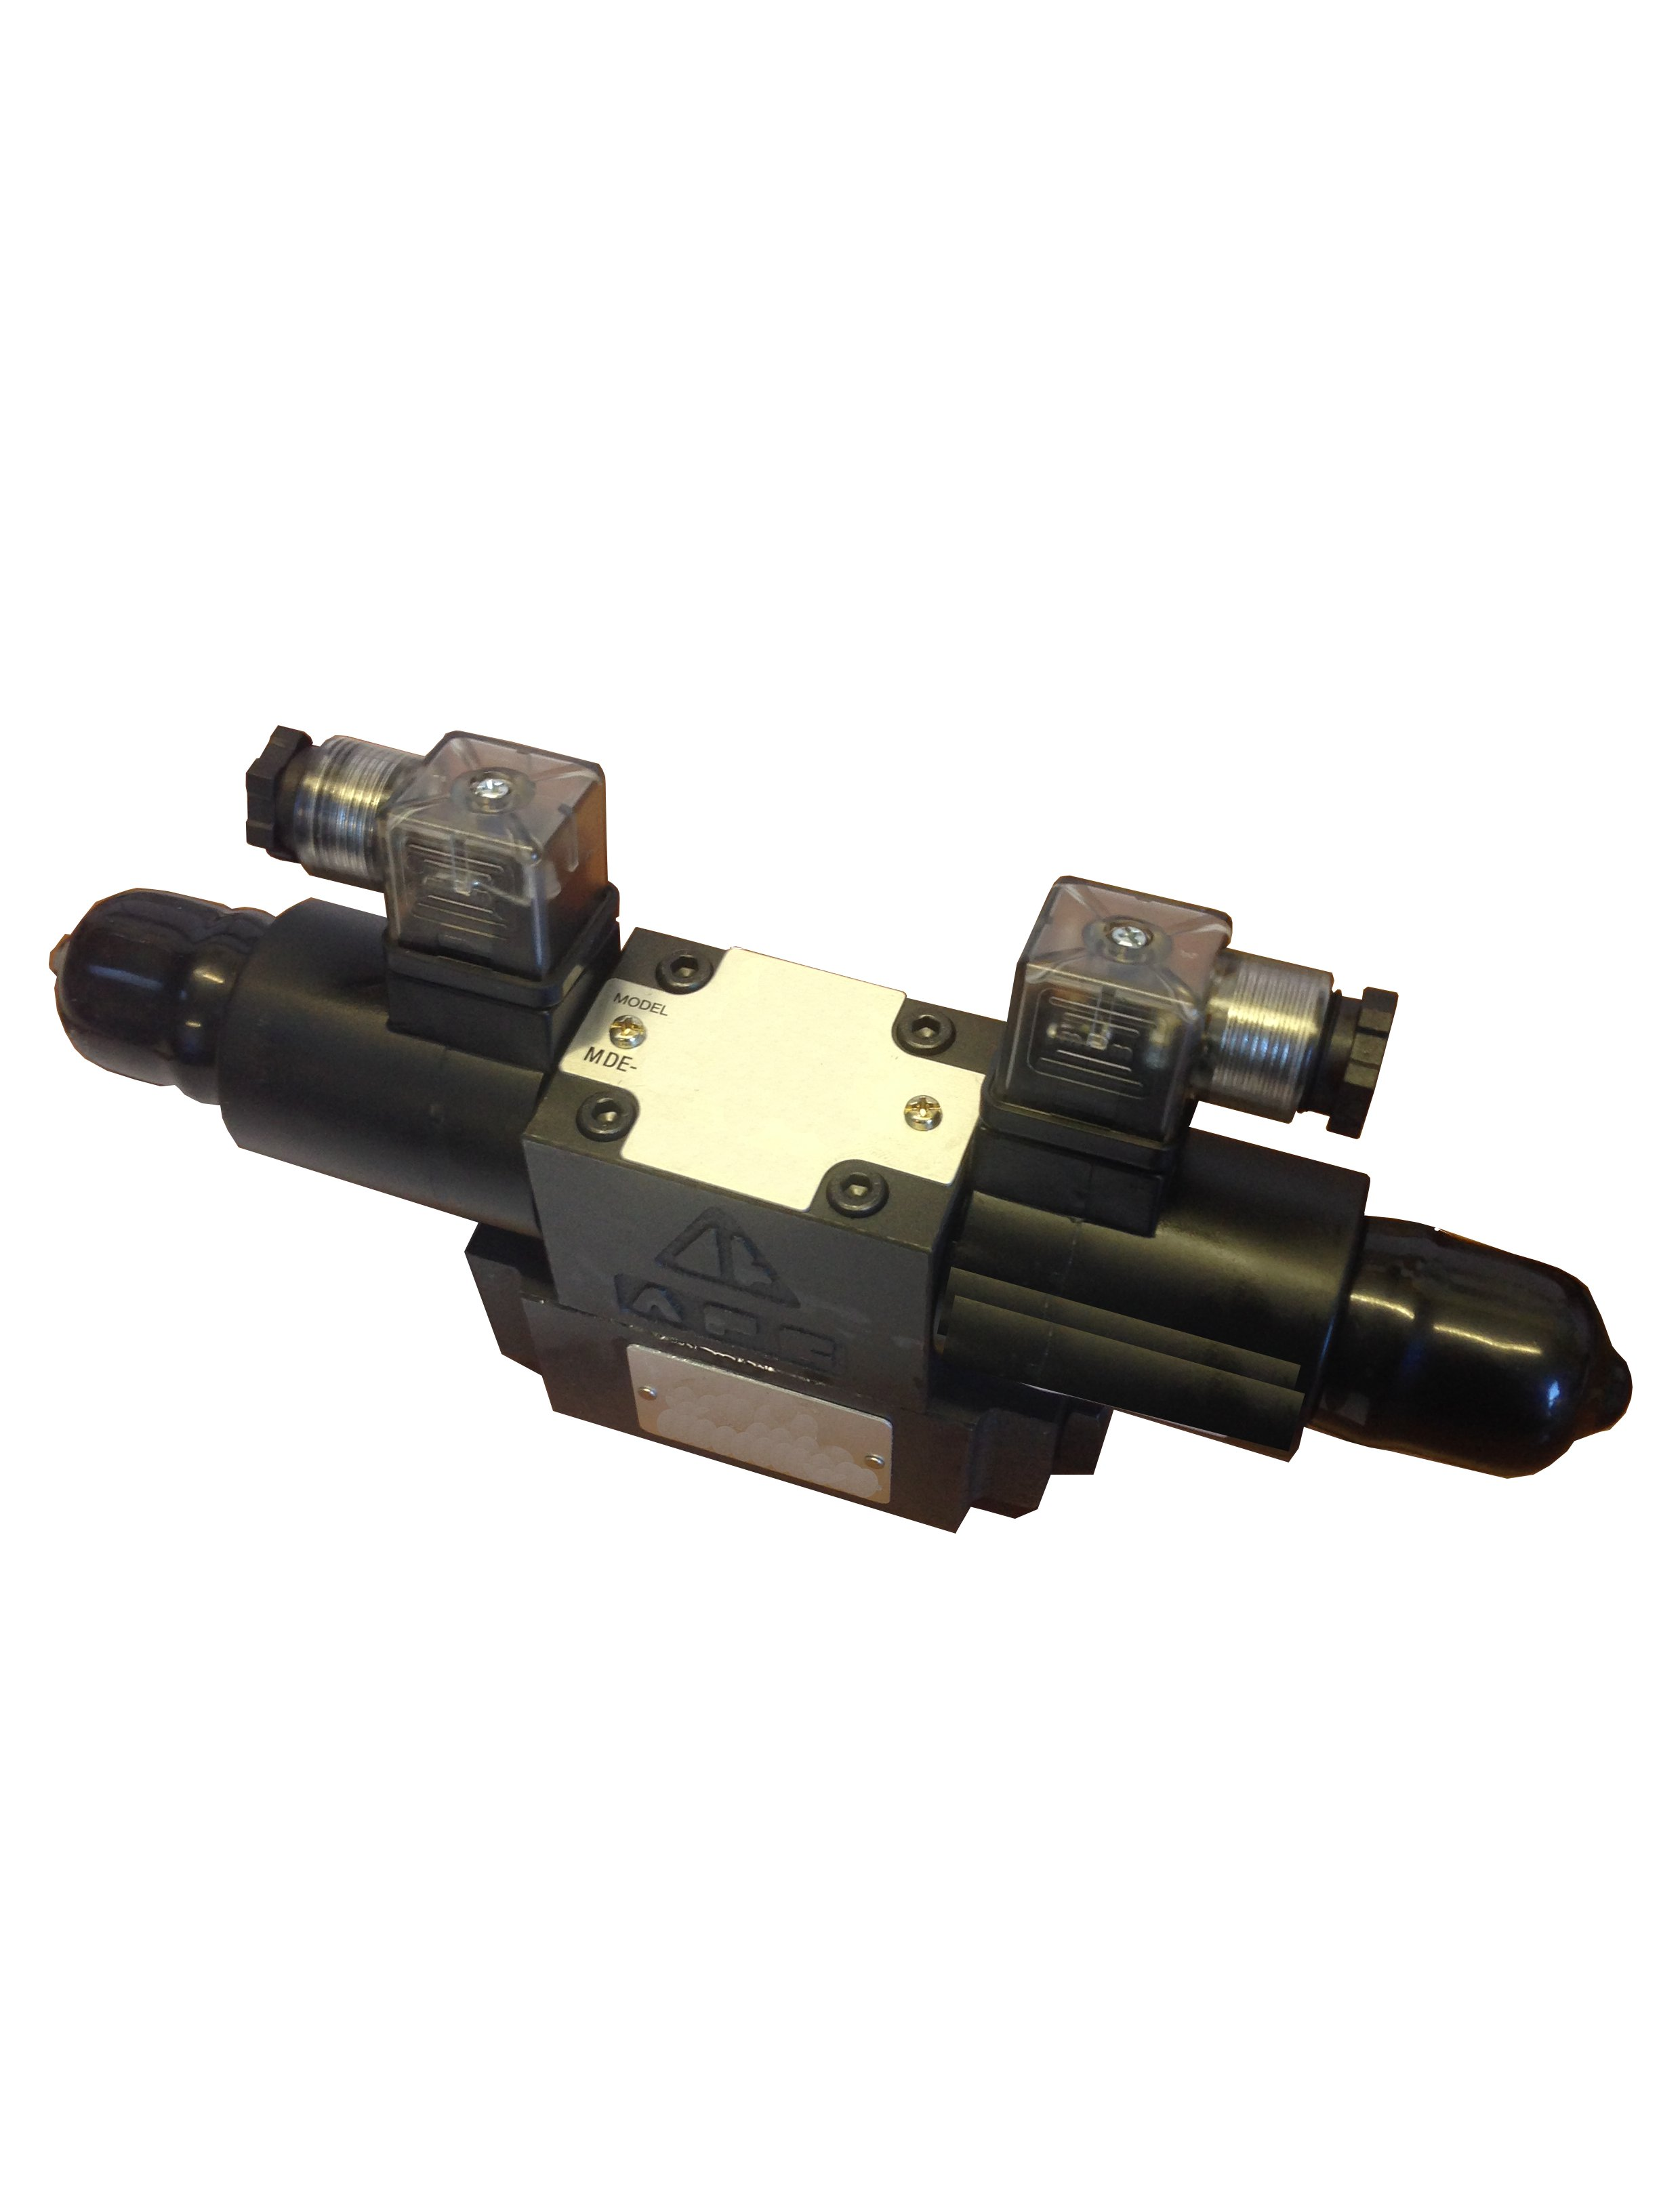 Solenoid valve (24v)